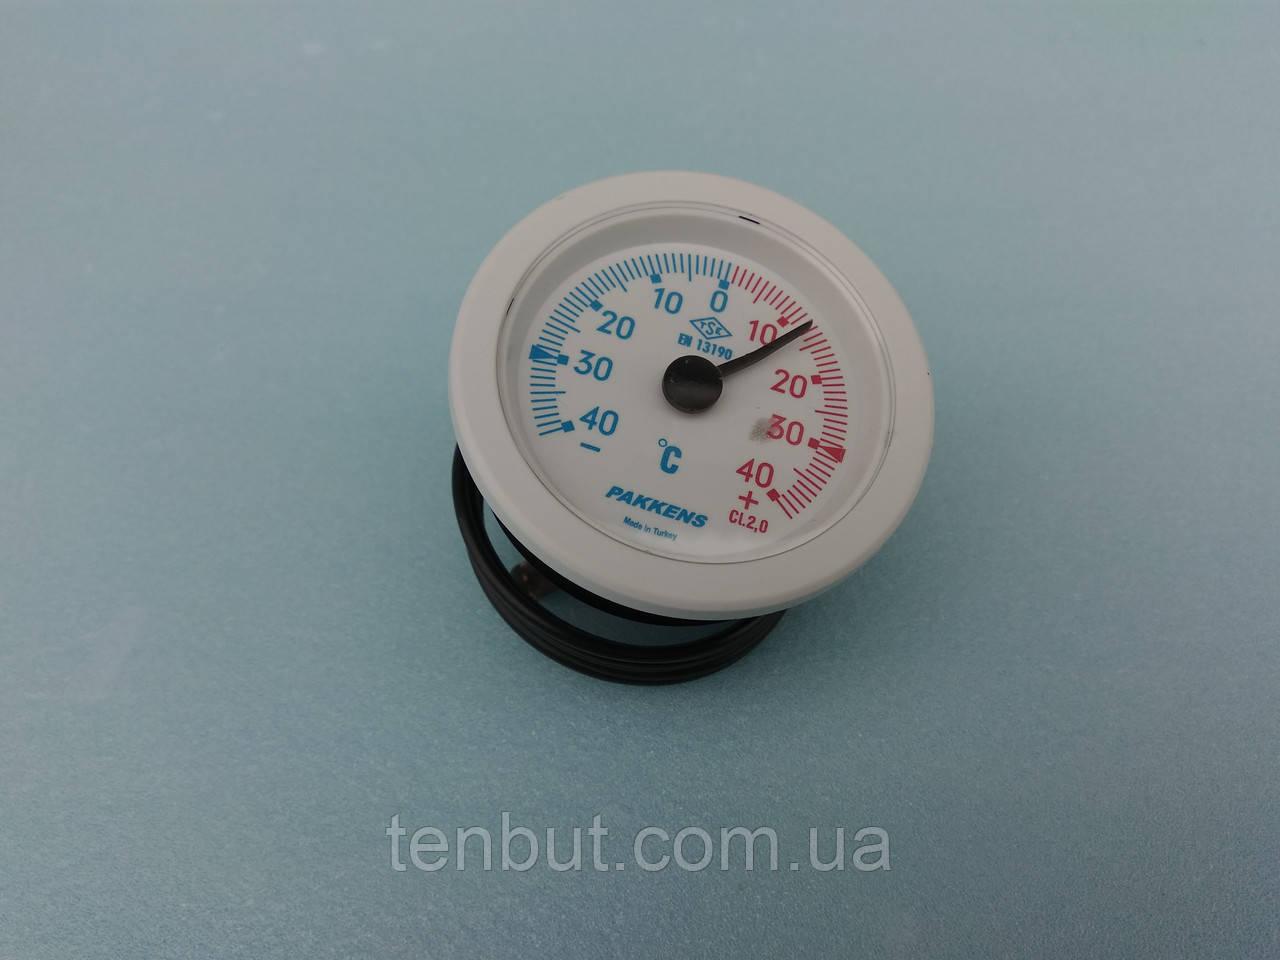 Термометр с капилляром 40℃±40℃ град. / Ø -52 мм./1-метр PAKKENS